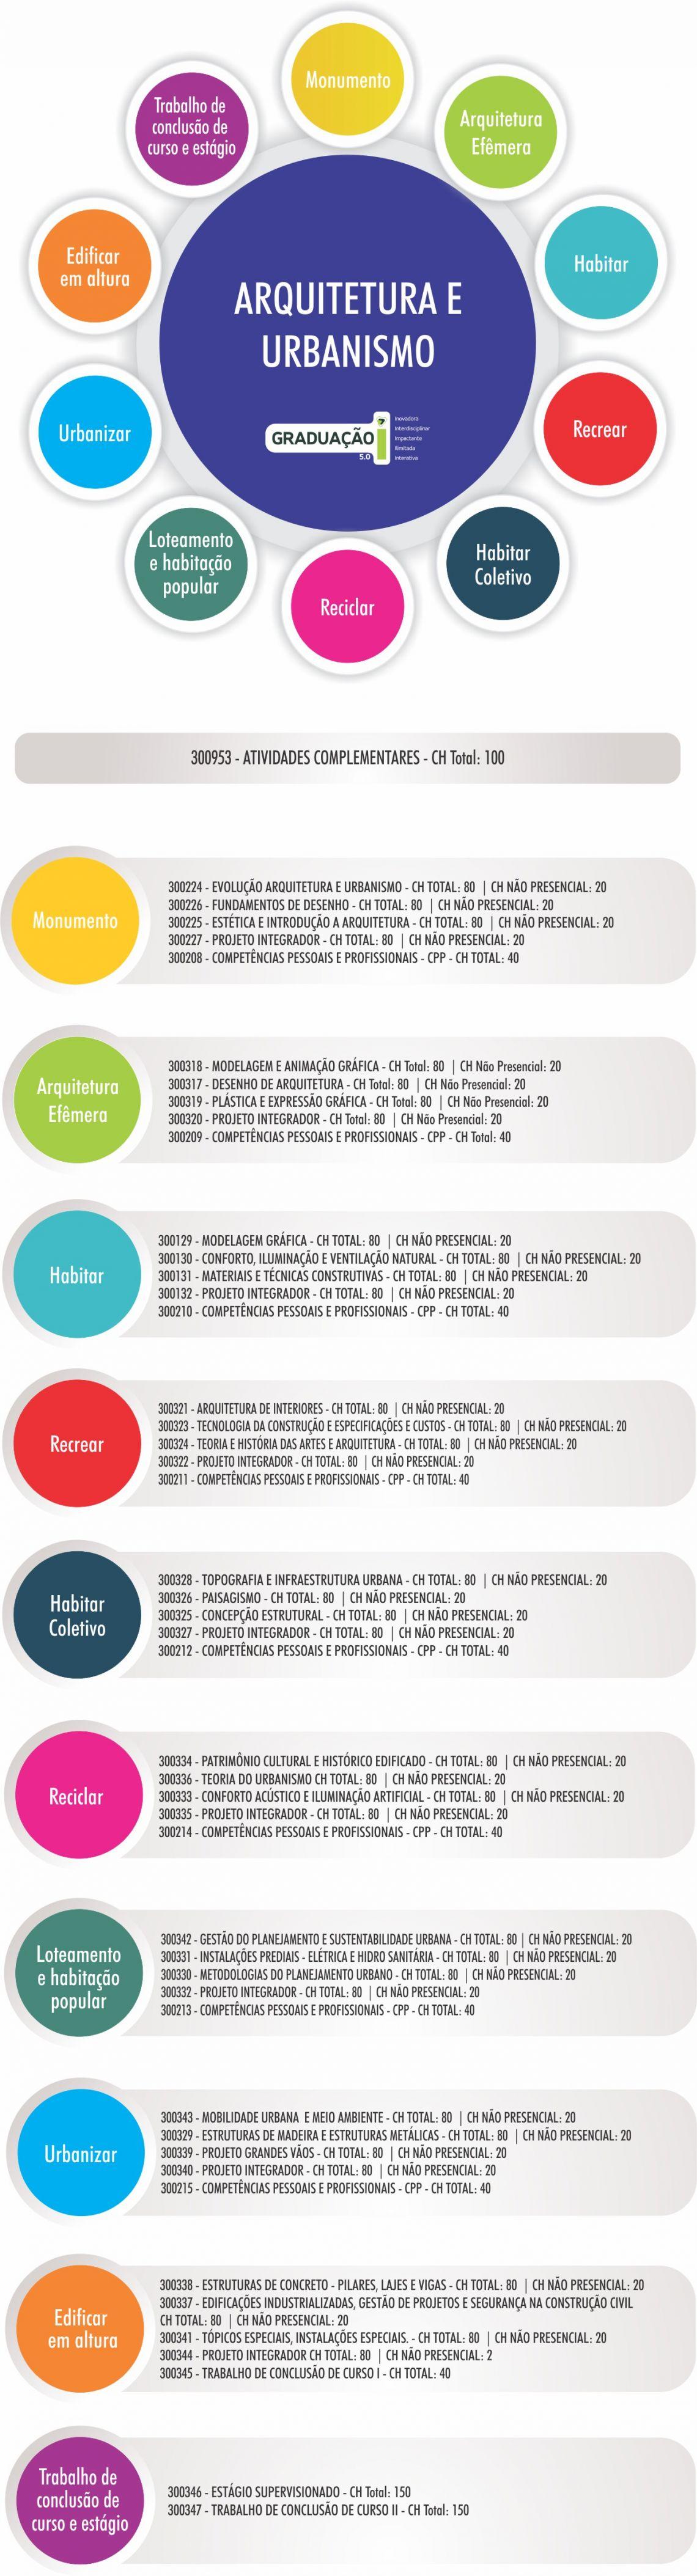 infografico_cur141350.jpg